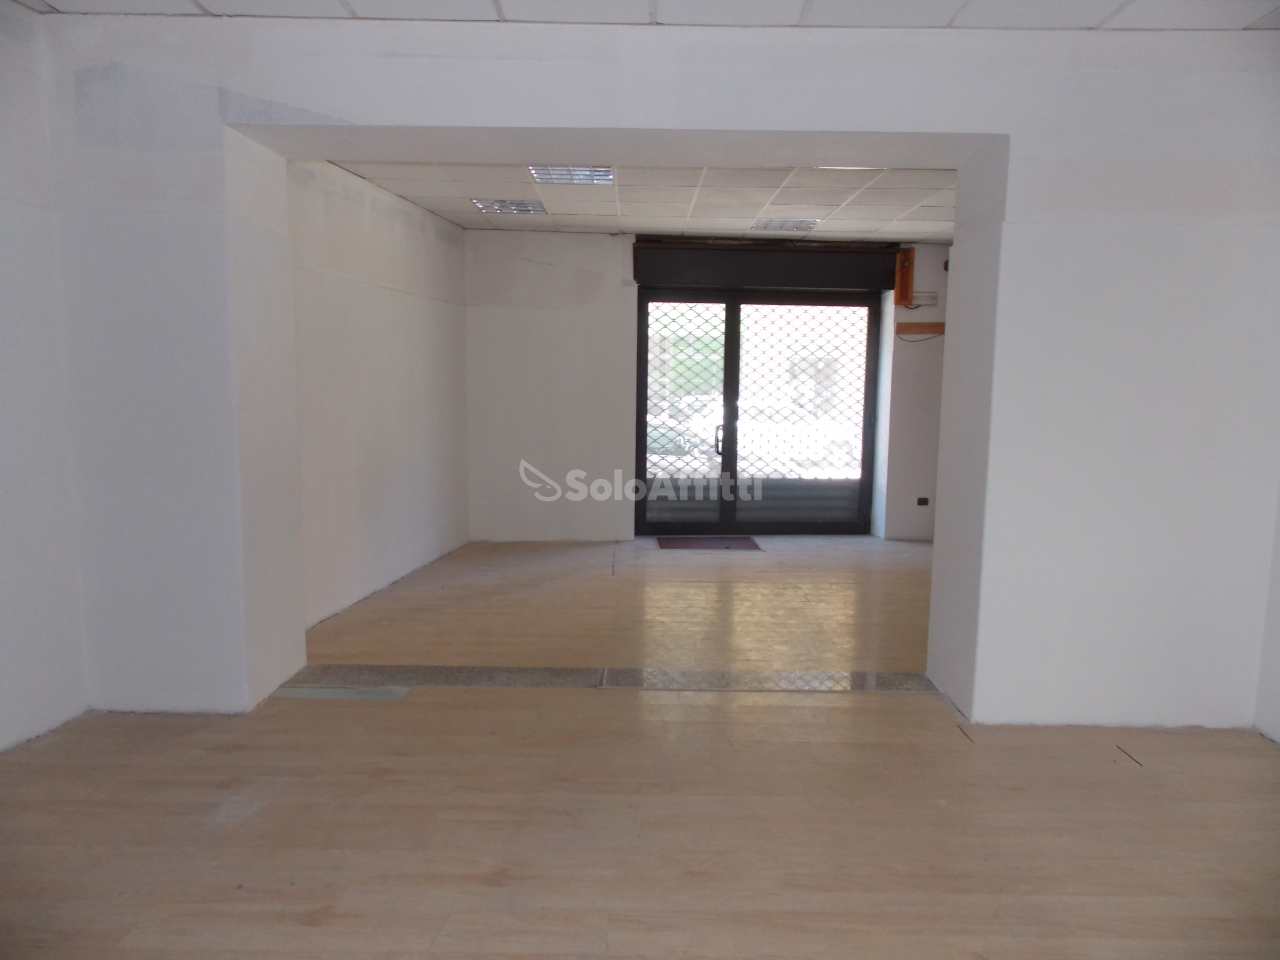 Fondo/negozio - 2 vetrine/luci a Centro storico, Novara Rif. 6371803